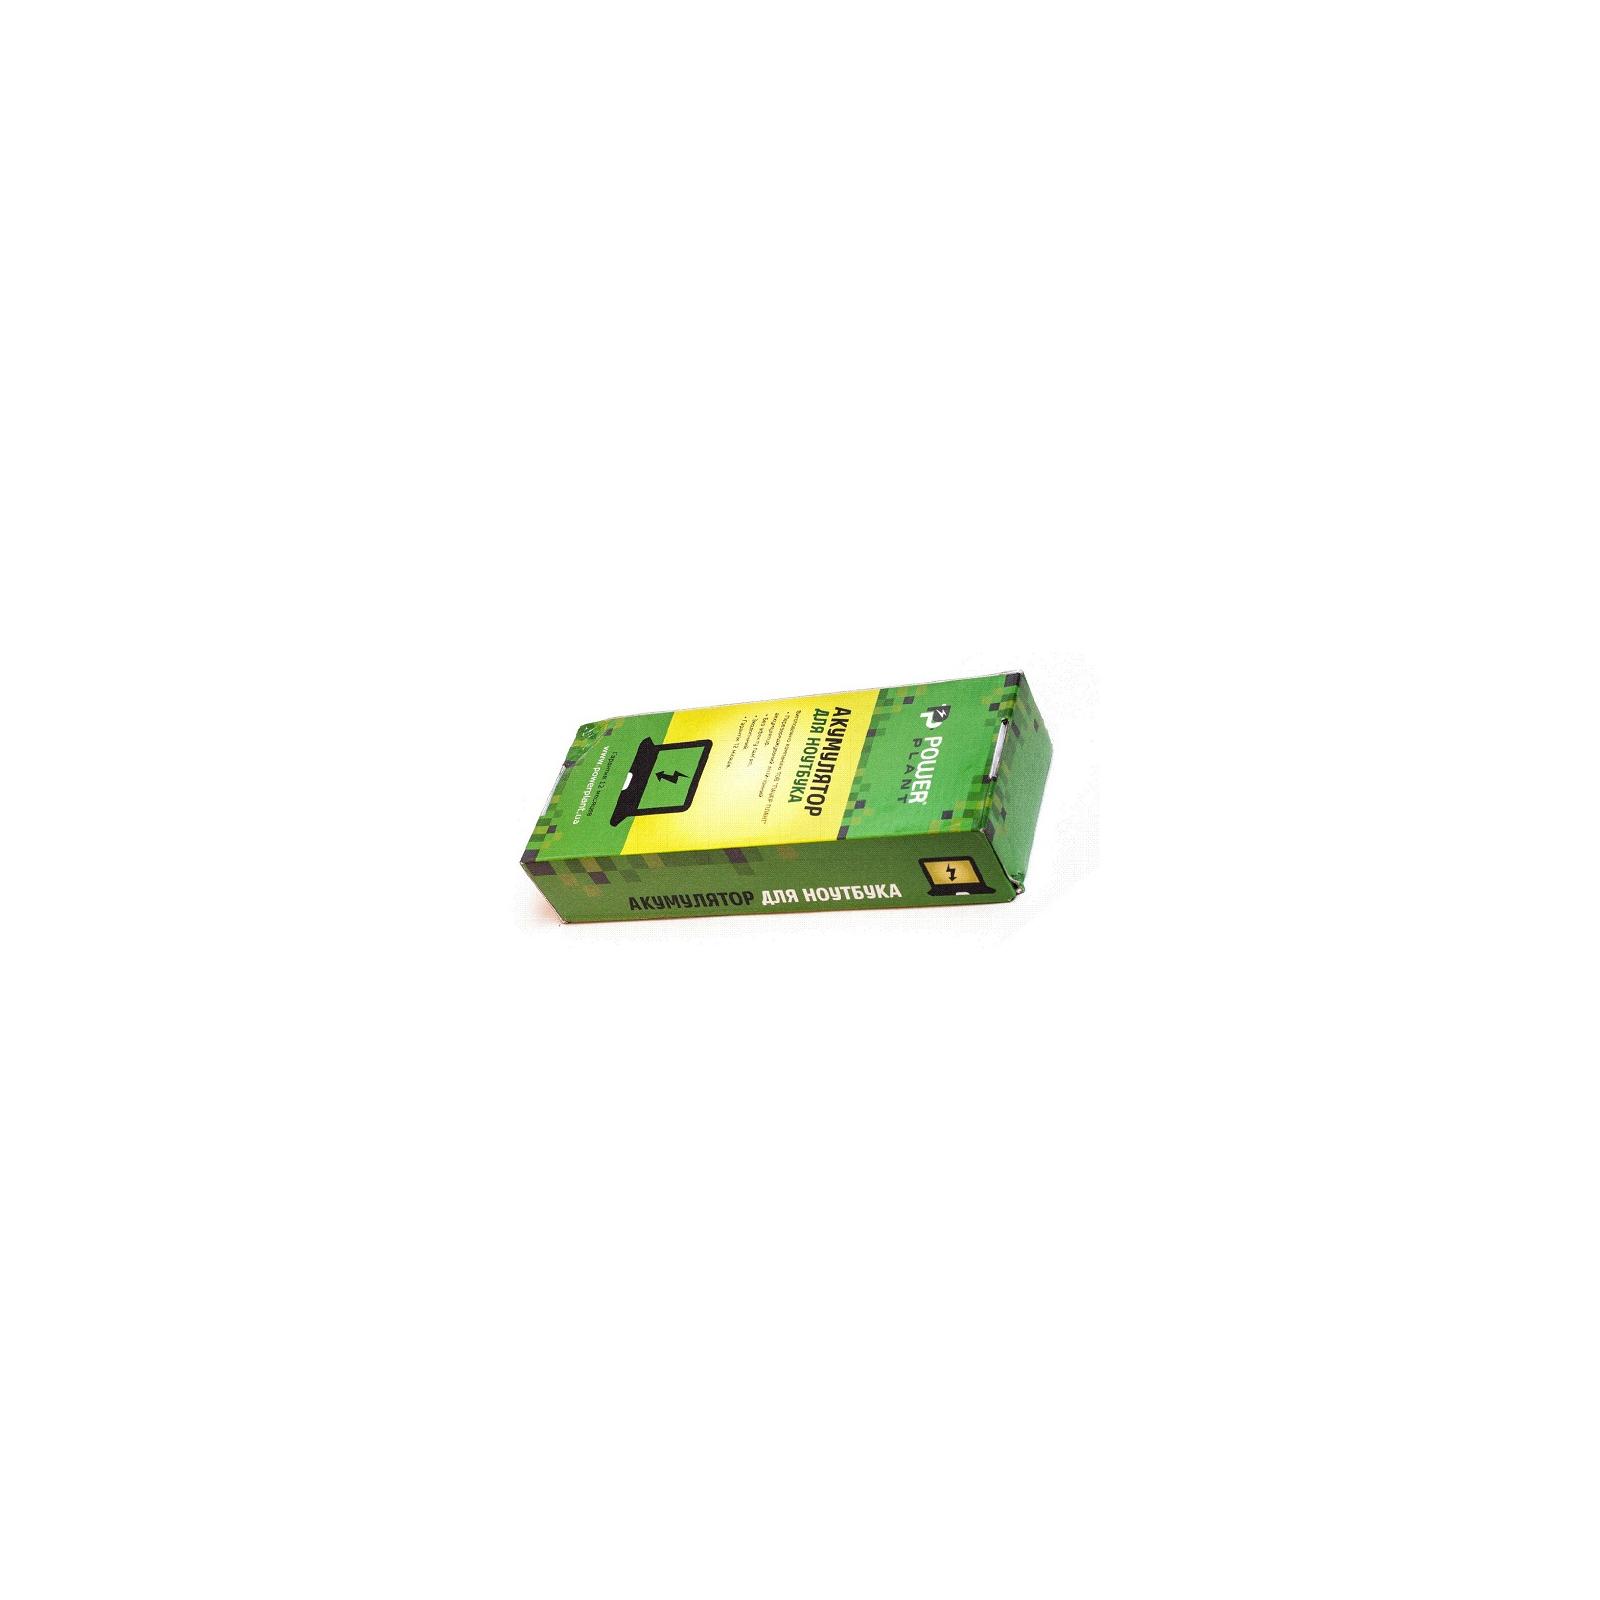 Аккумулятор для ноутбука DELL Studio 1535 (WU946, DE 1537 3S2P) 11.1V 5200mAh PowerPlant (NB00000051) изображение 3